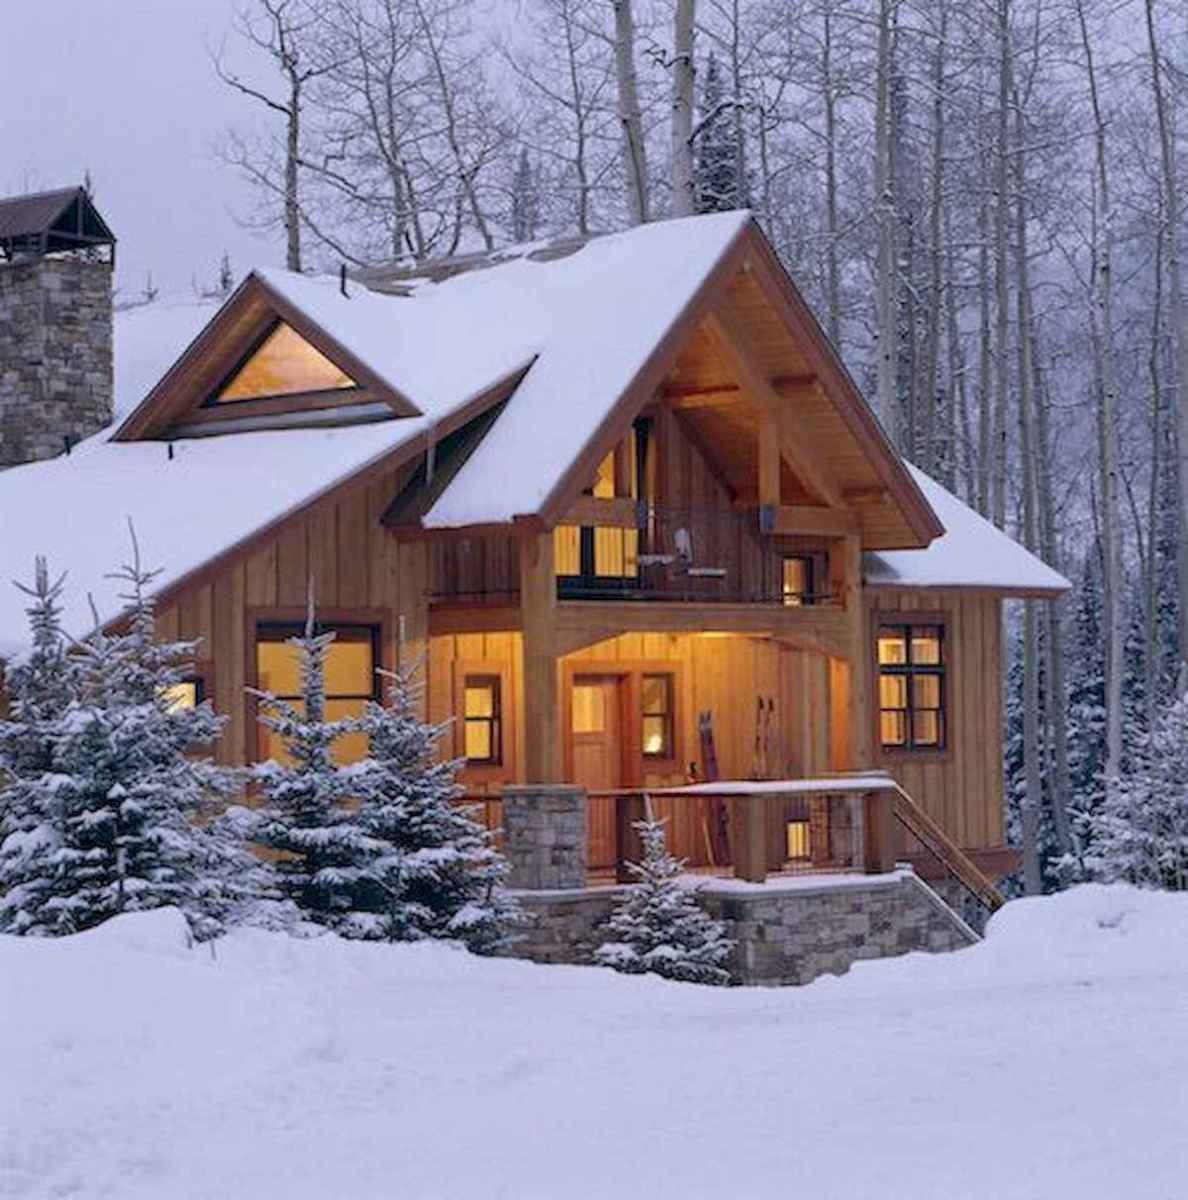 70 Fantastic Small Log Cabin Homes Design Ideas (46)